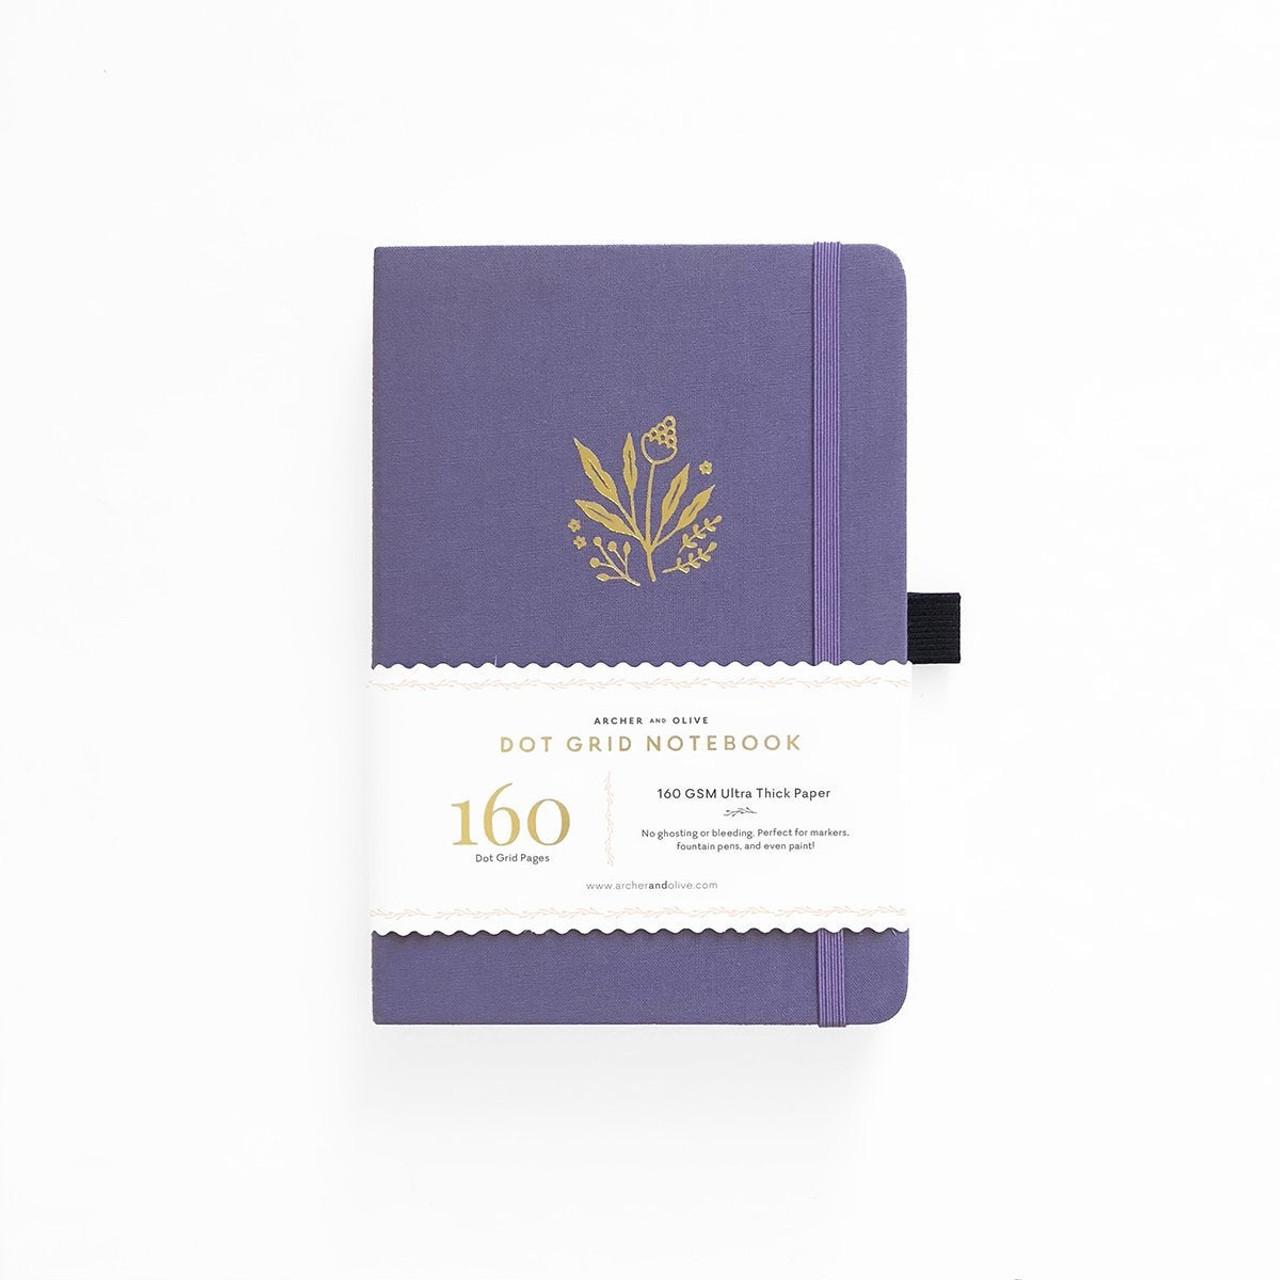 A5 Floral Details Dot Grid Notebook by Archer & Olive